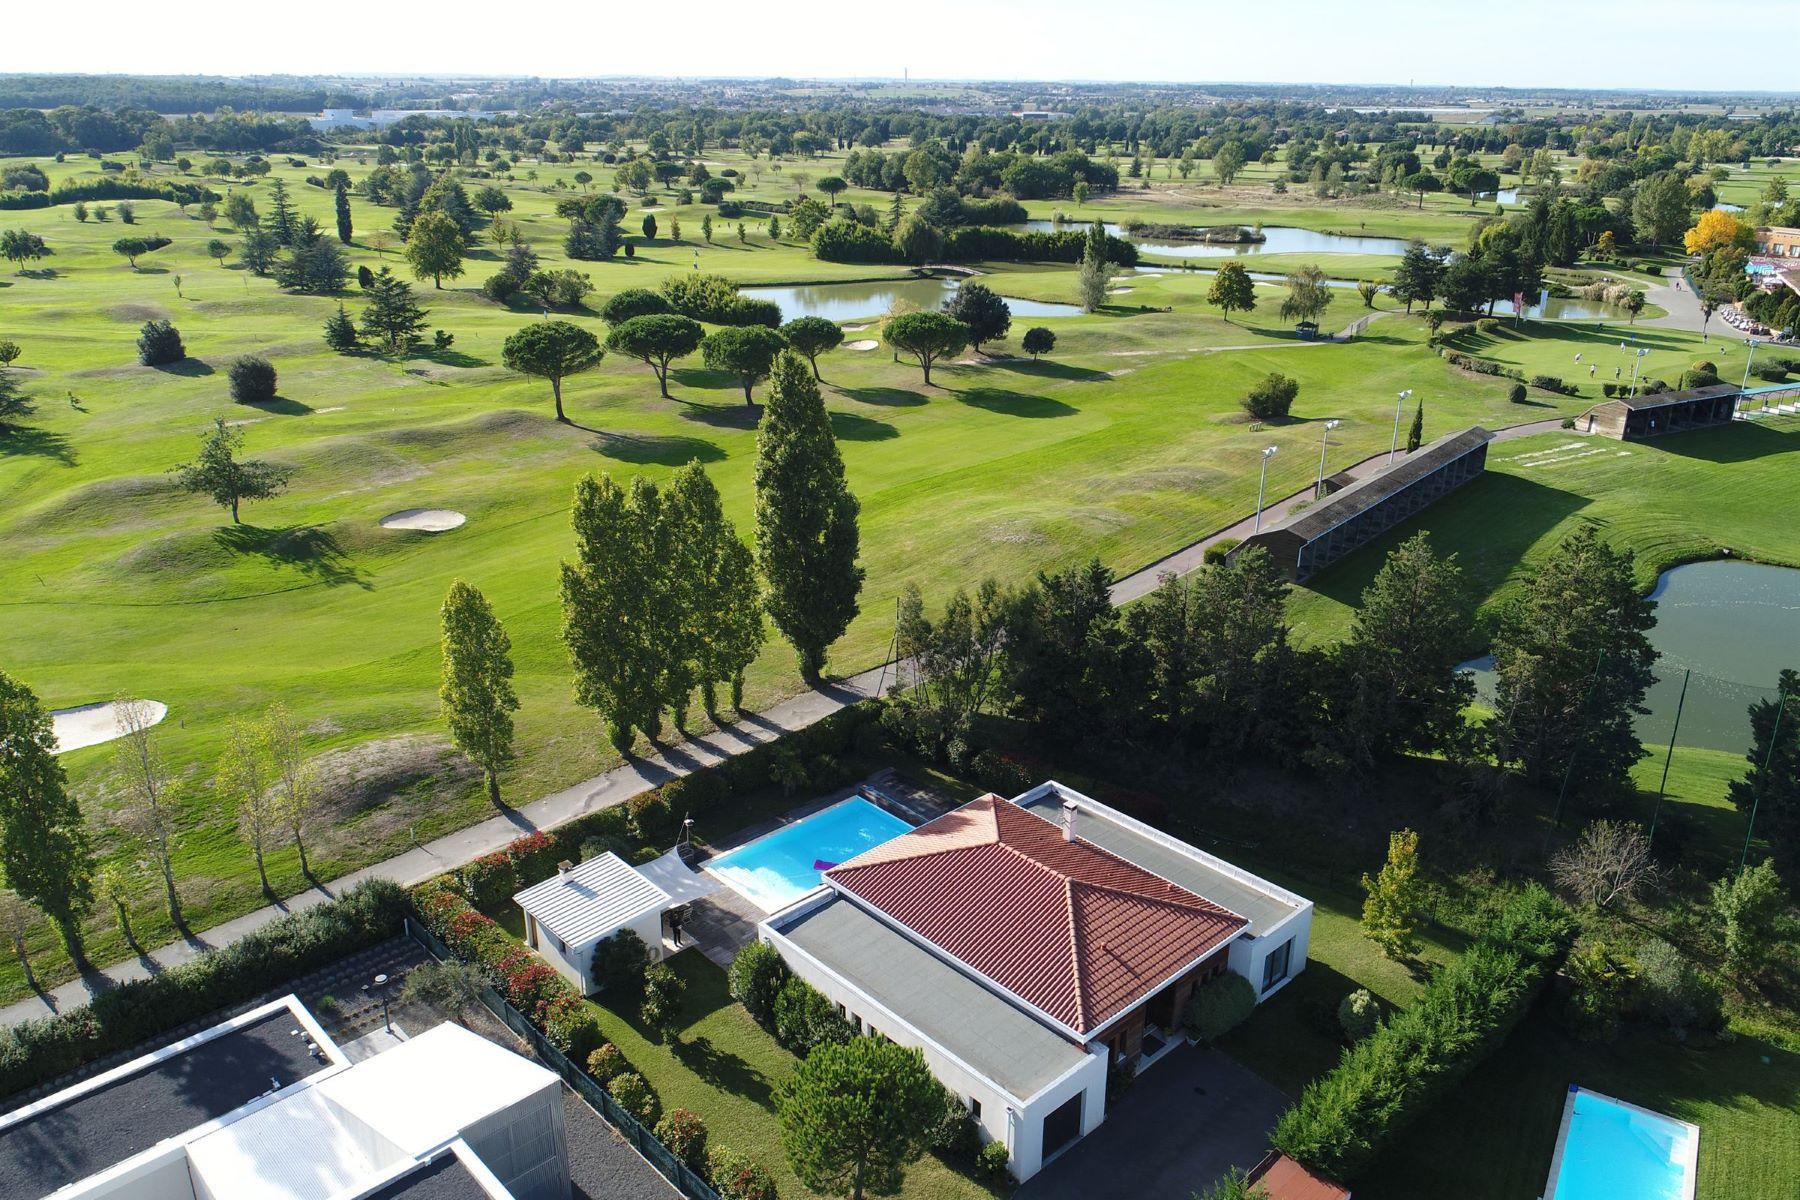 独户住宅 为 销售 在 On golf course Toulouse, Midi Pyrenees, 31000 法国